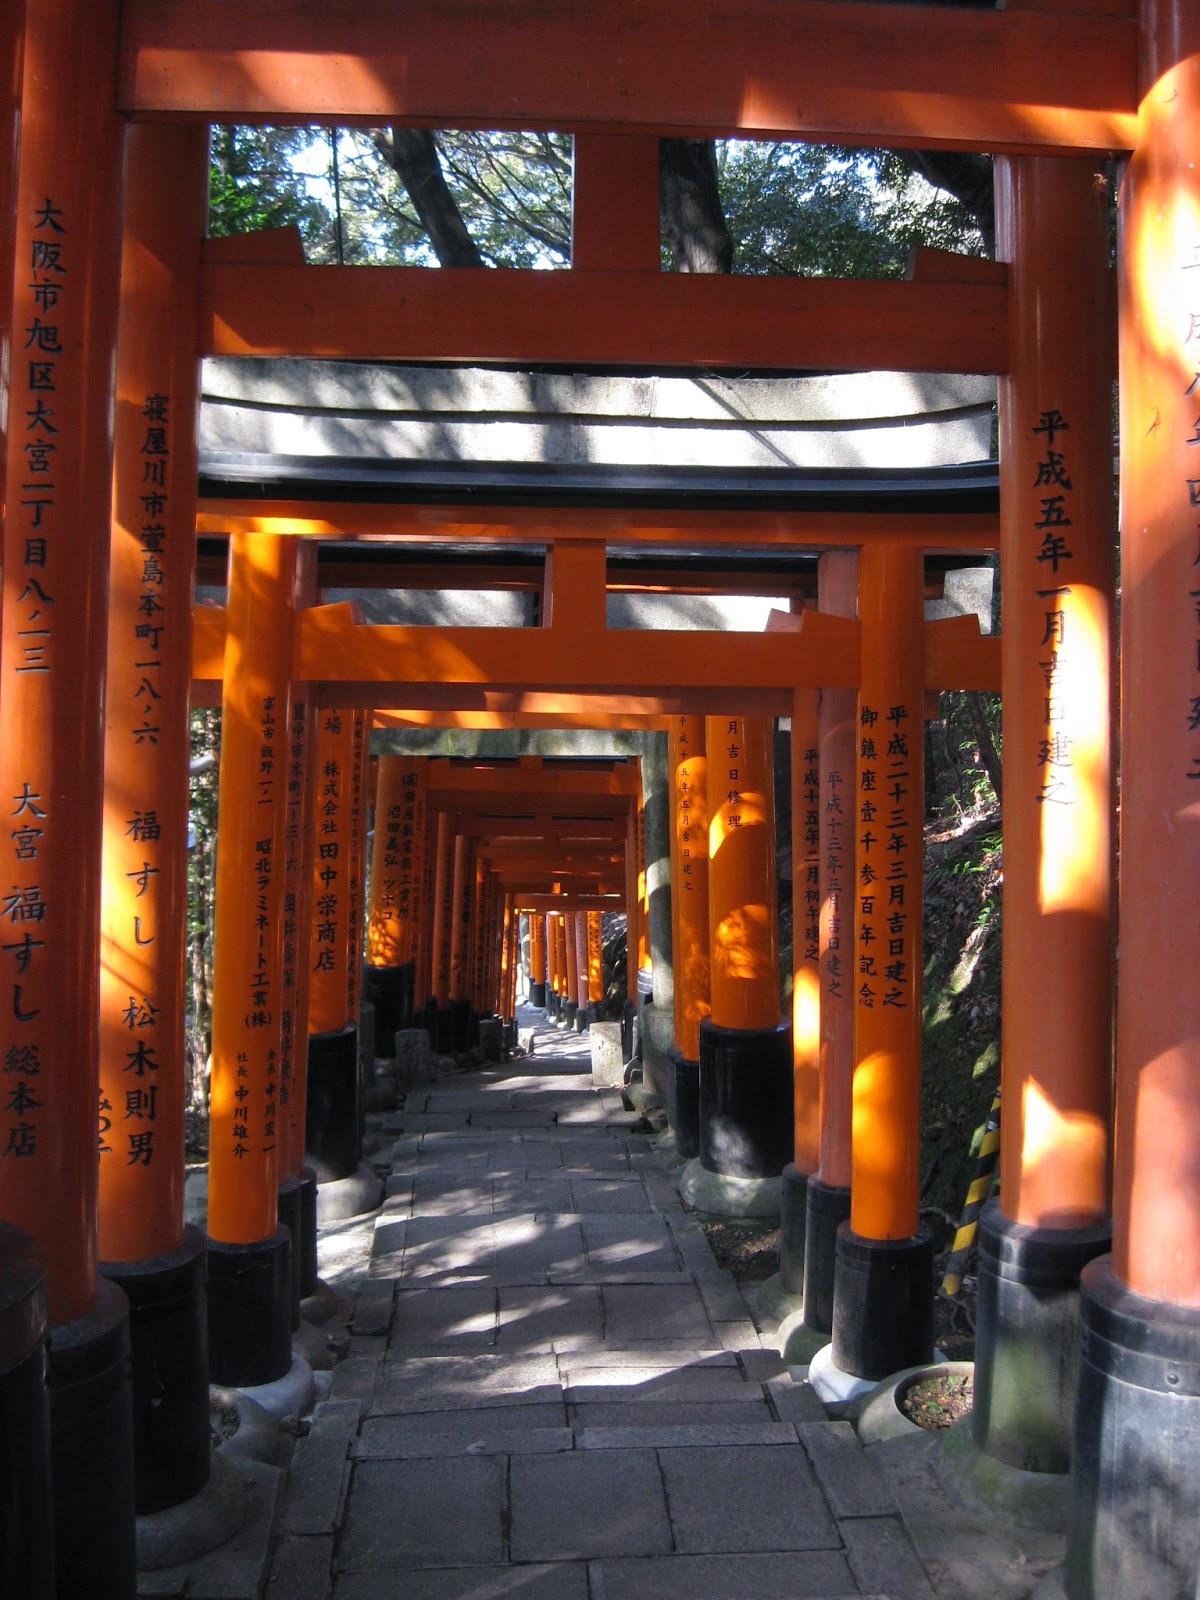 Kyoto - Fushimi Inari-taisha Shrine gates